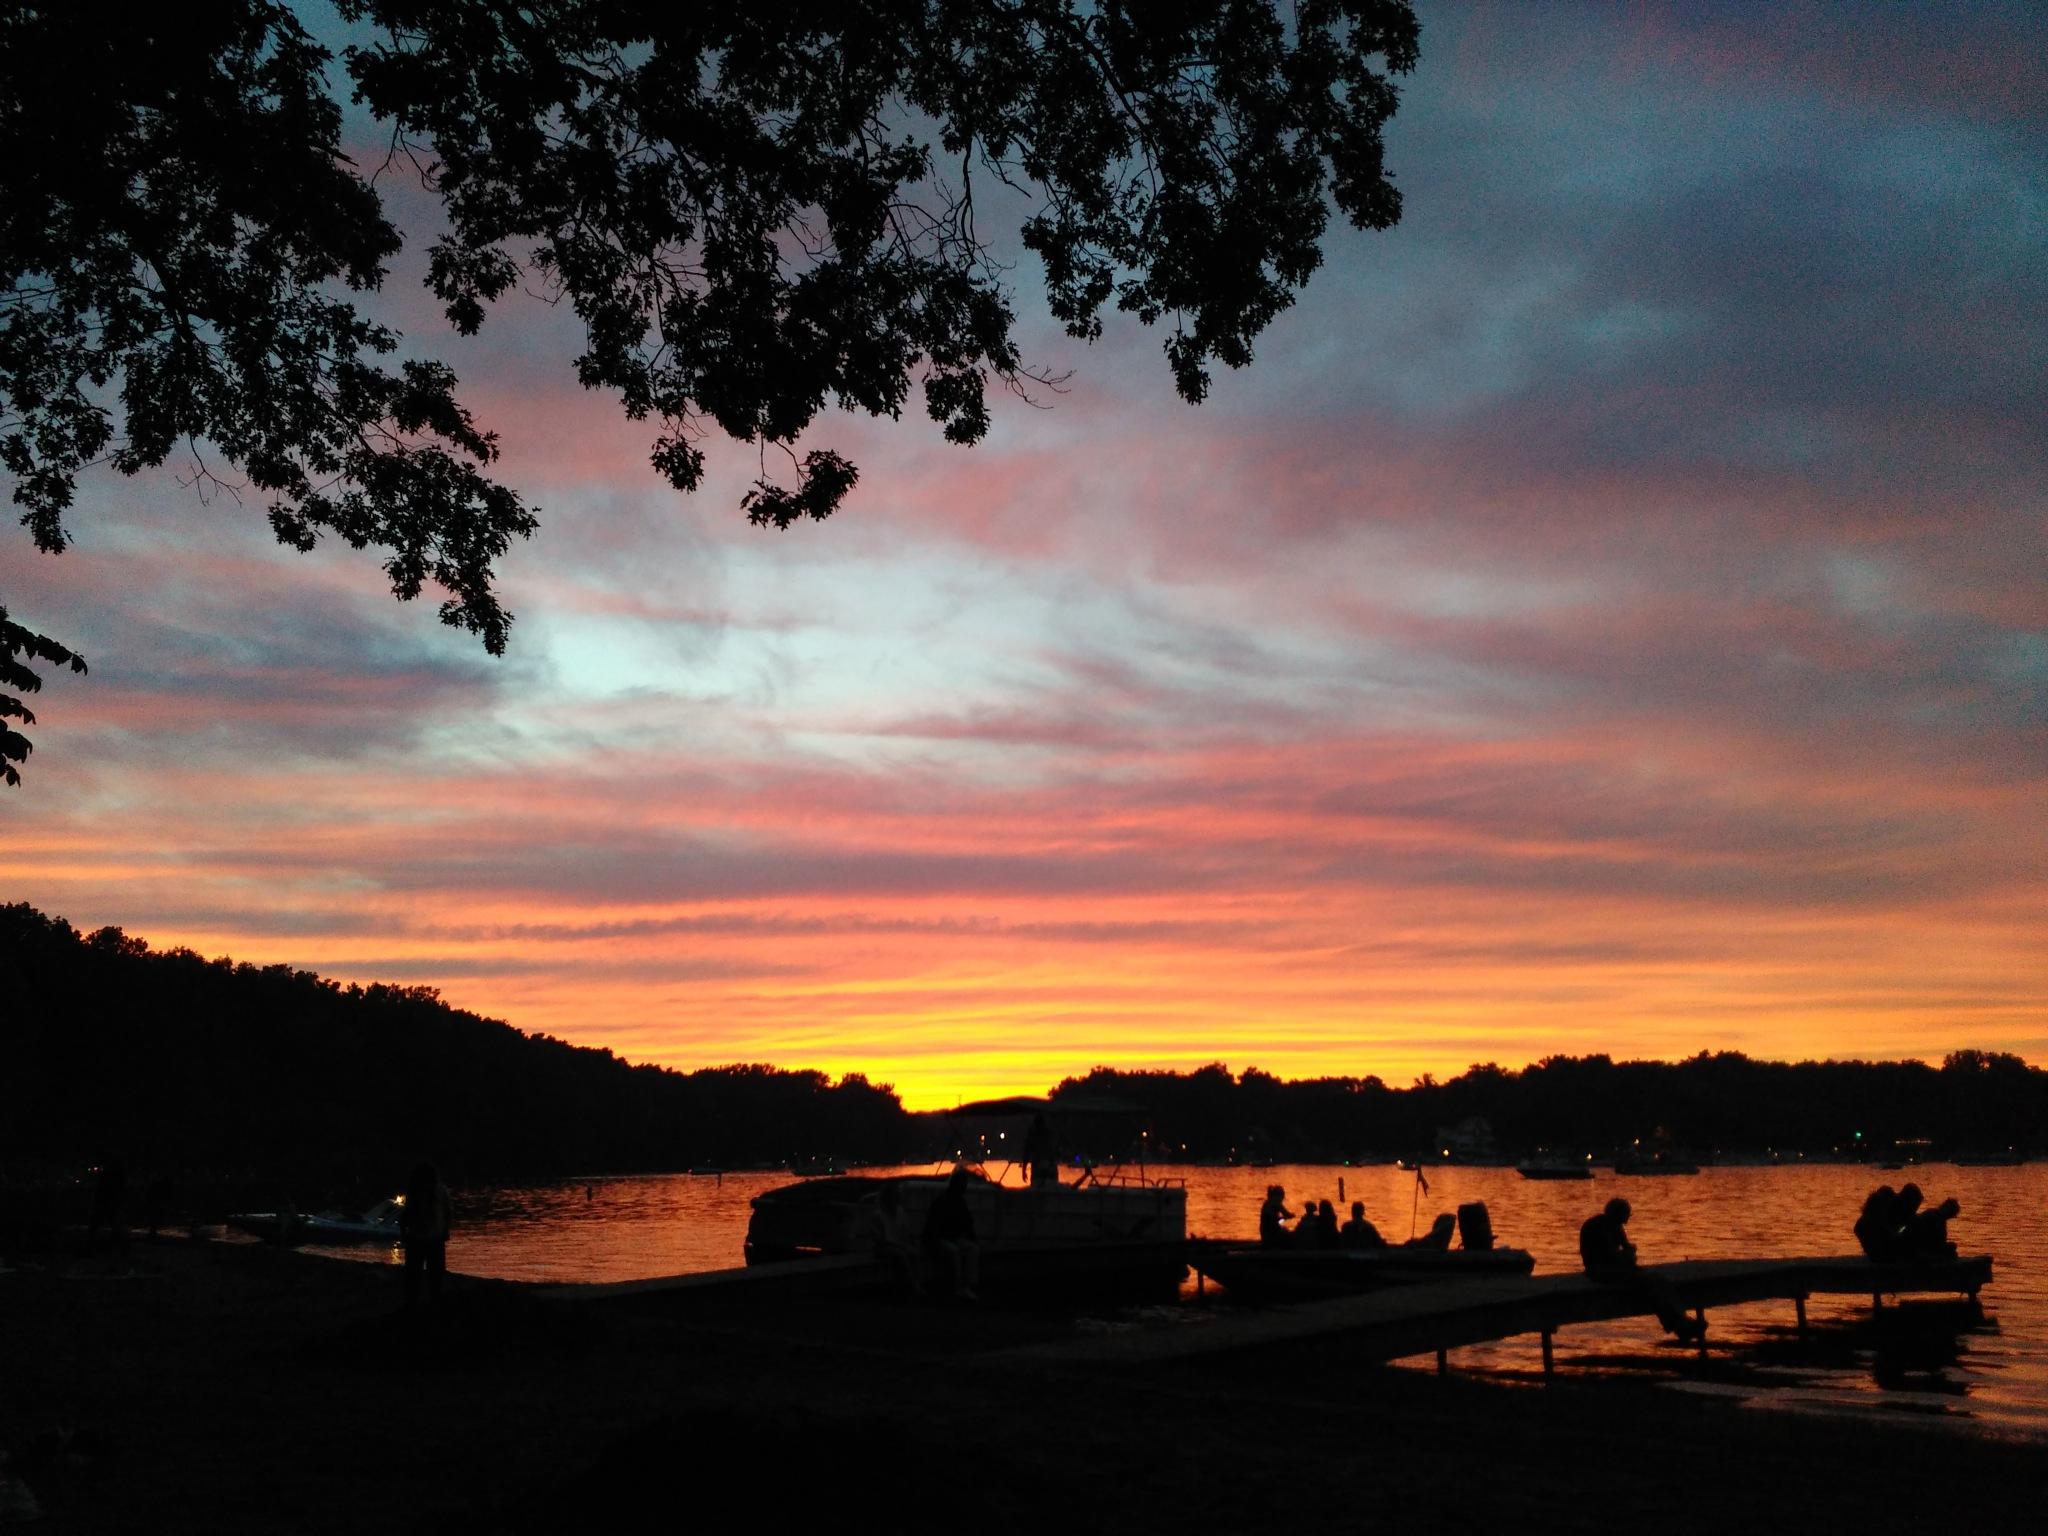 4th of July Sunset by Kathleen Velten